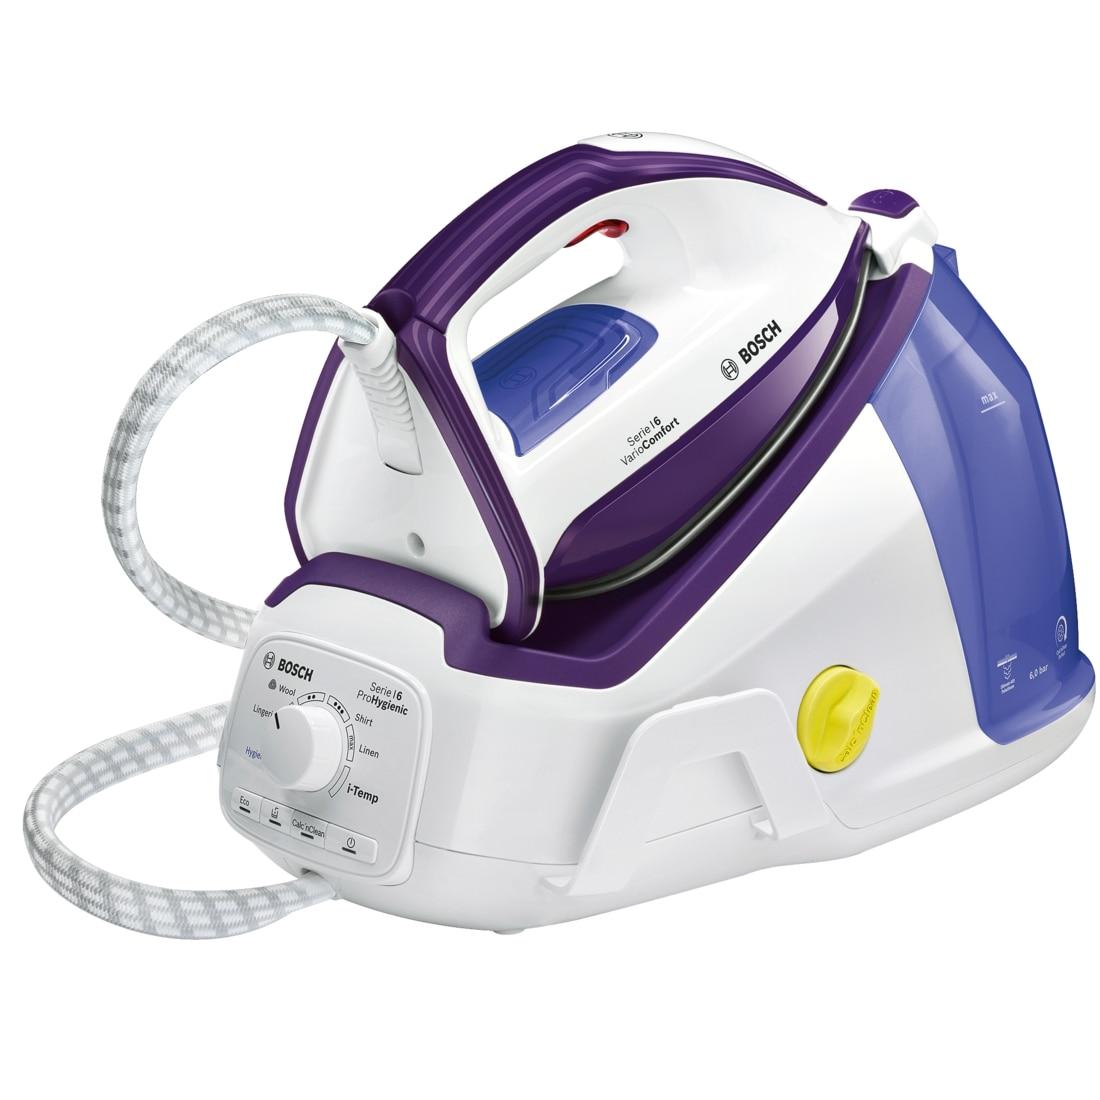 Fotografie Statie de calcat Bosch TDS6080, Talpa CeraniumGlissée Pro, 2400W, 400 g, 1.5 l, Functie Eco, Functie I-Temp Advanced,Program Hygiene, Alb/Mov